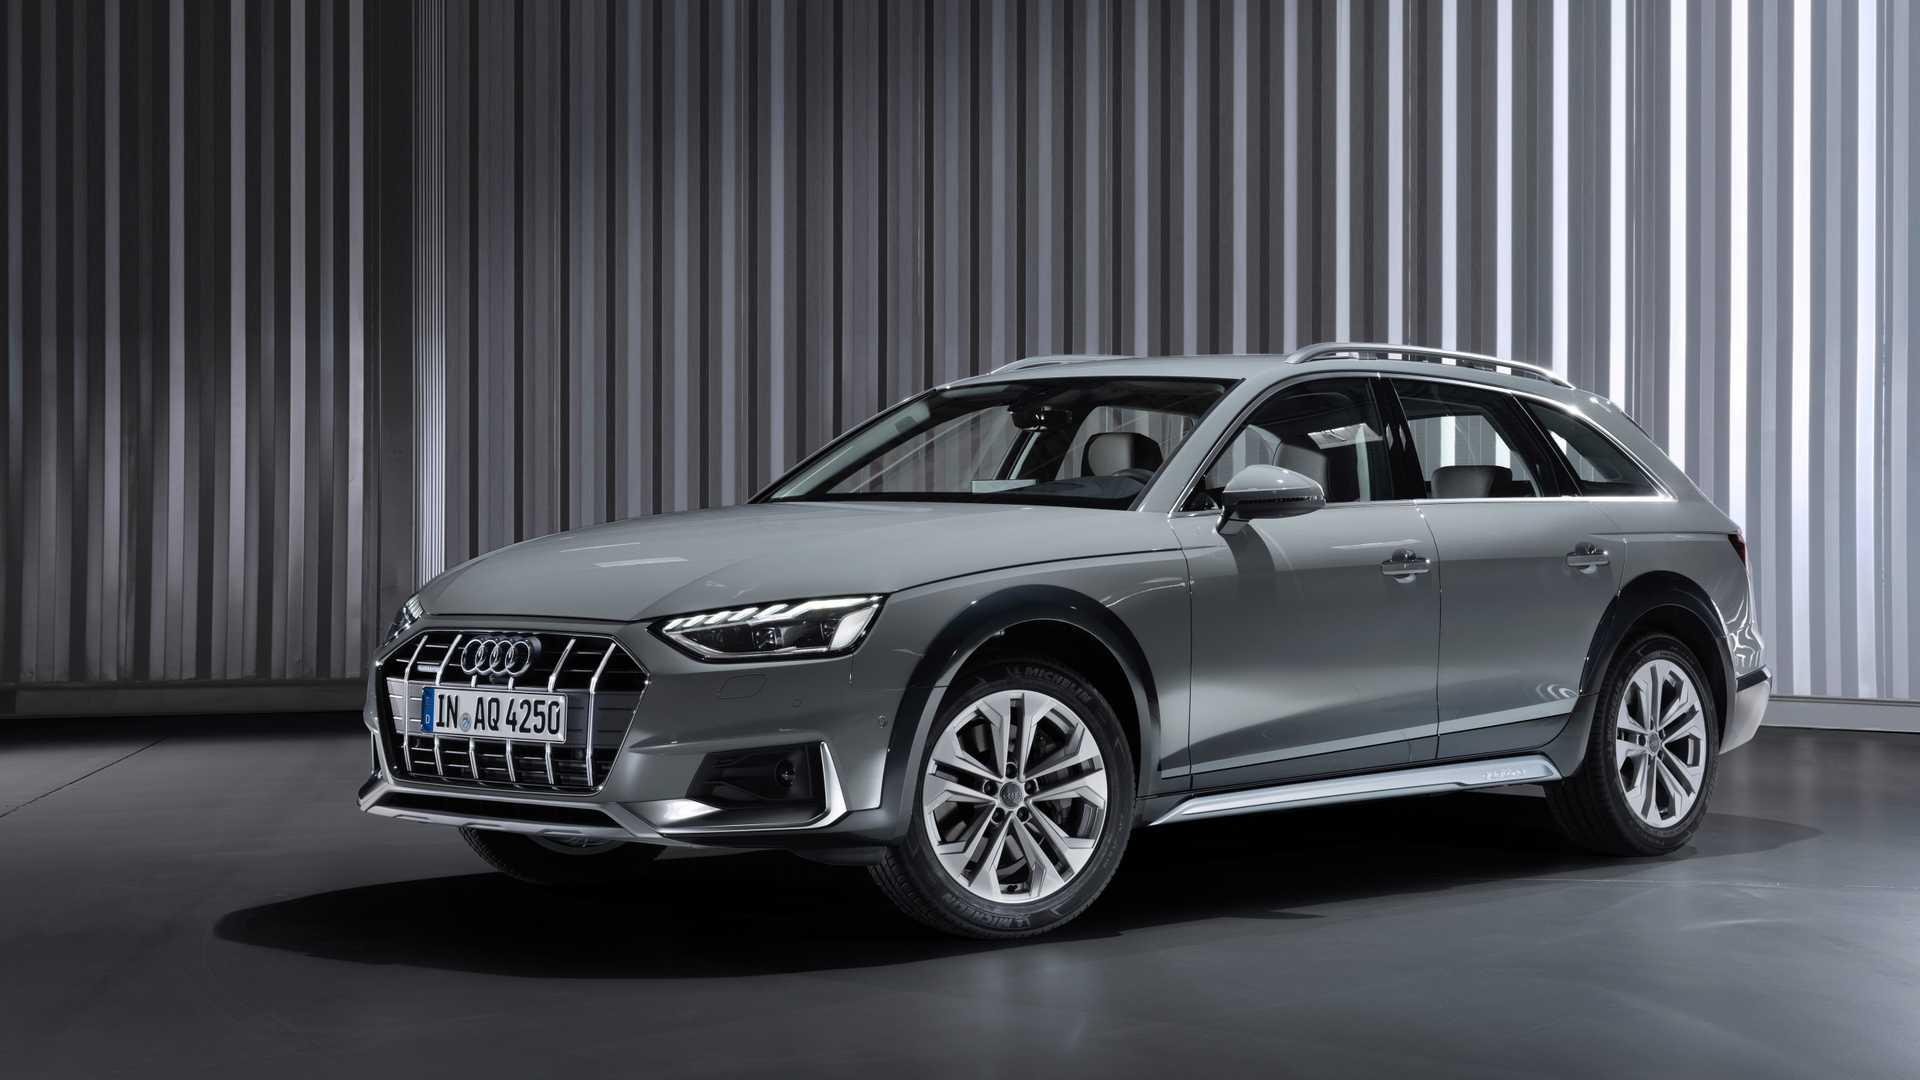 Kelebihan Audi A4 2020 Tangguh